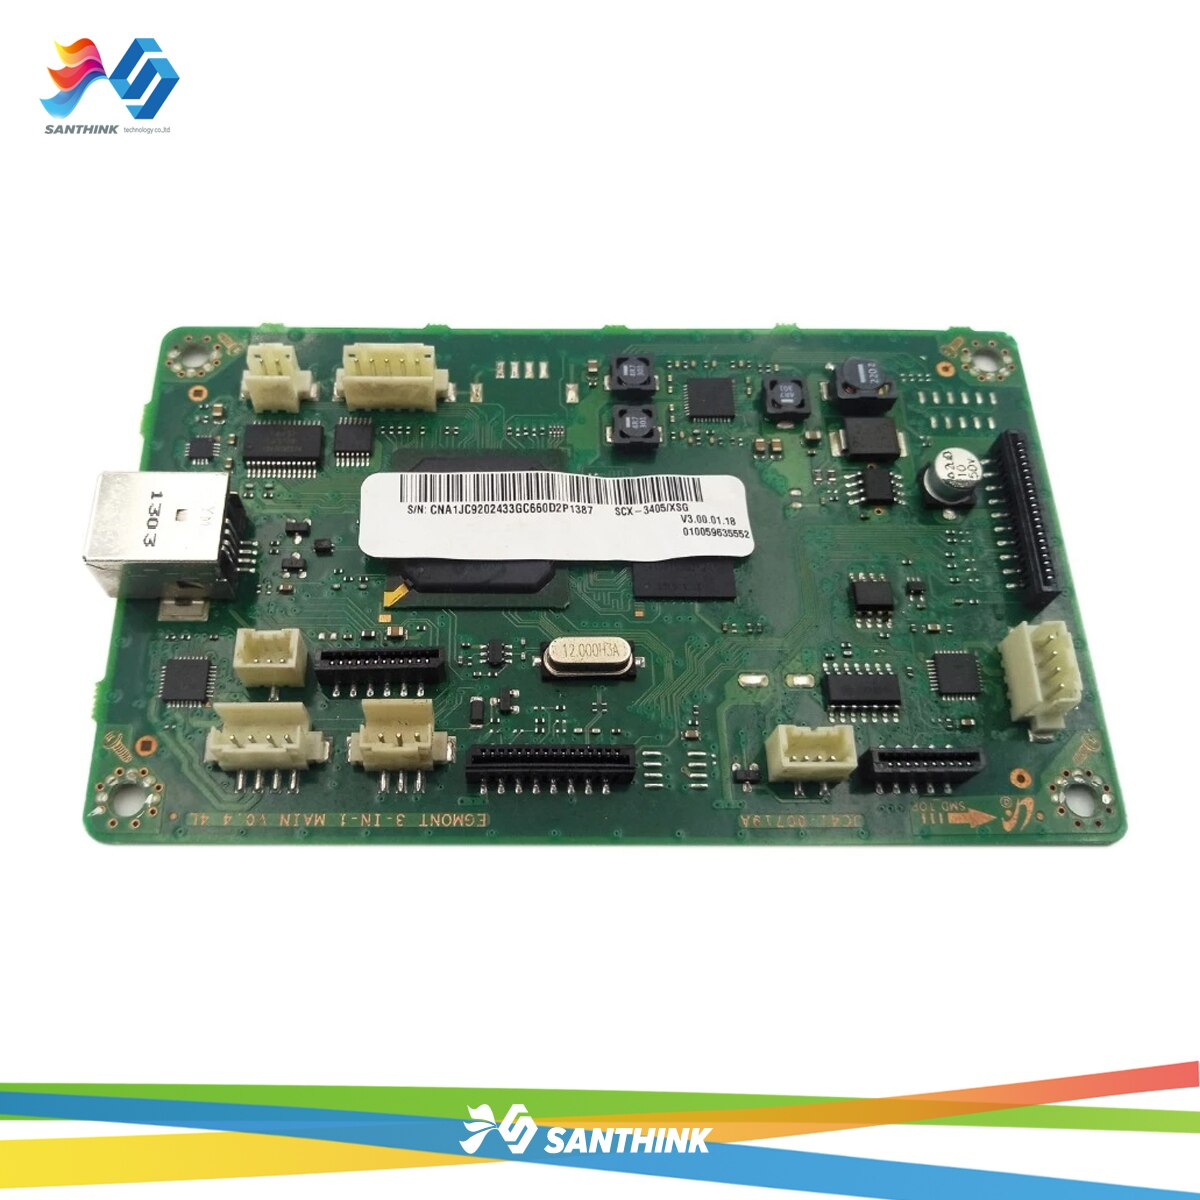 JC41-00719A المنطق اللوحة الرئيسية ل سامسونج SCX-3400 SCX-3401 SCX-3405 SCX 3400 3401 3405 SCX3405 SCX3400 مجلس المنسق